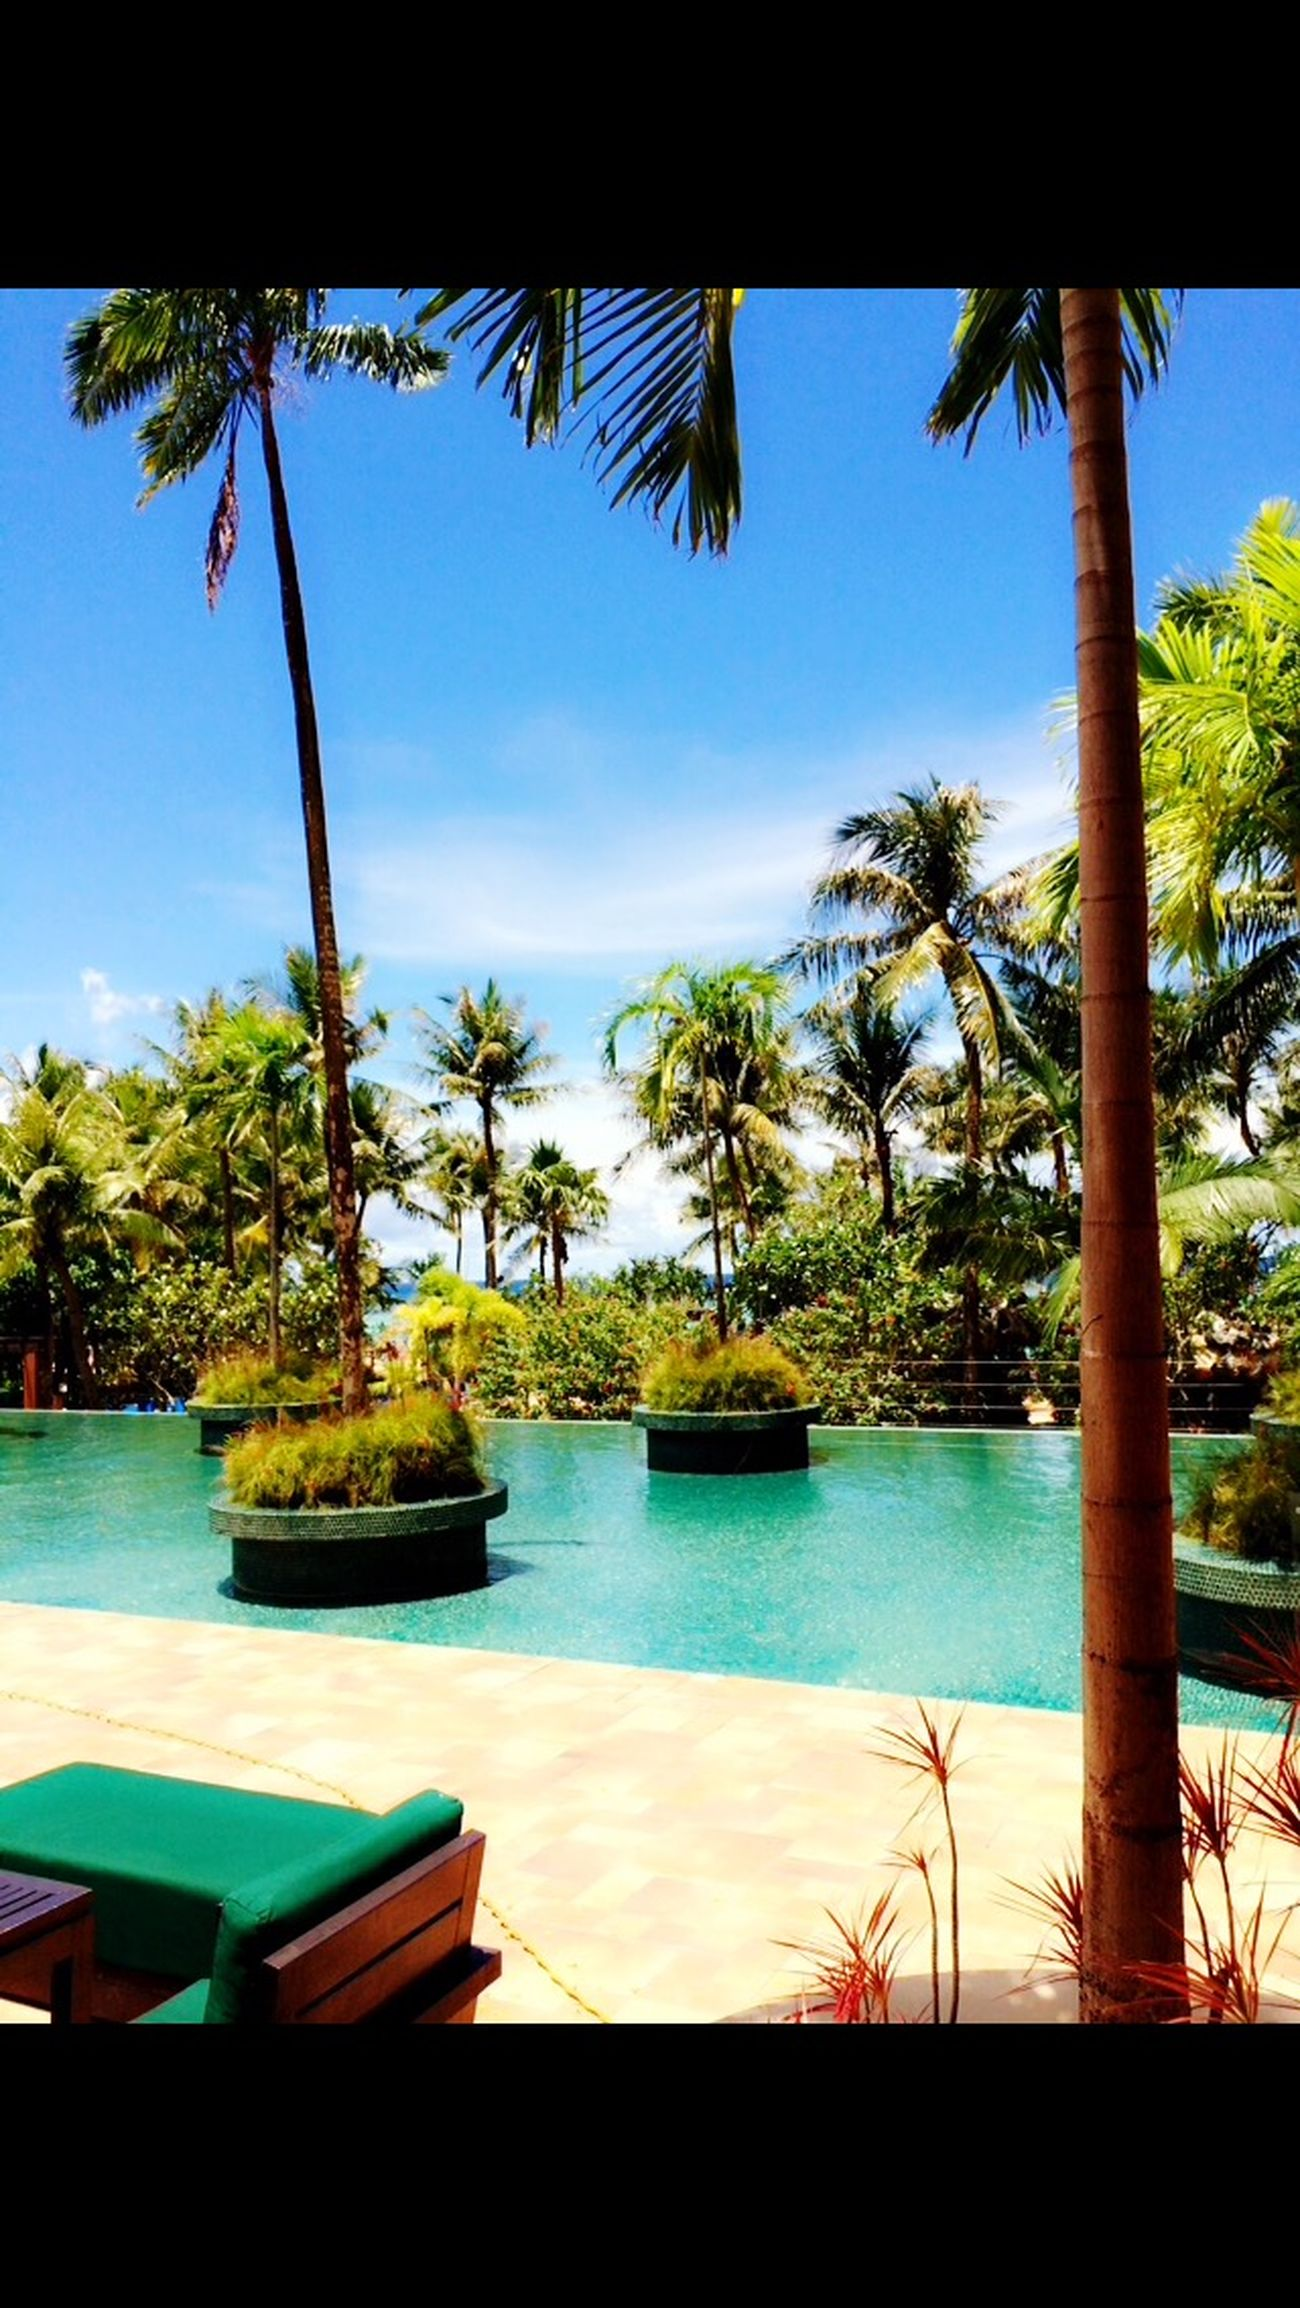 Tumon Traveling In Guam My Memories Hotel 💘 Beautiful Nature